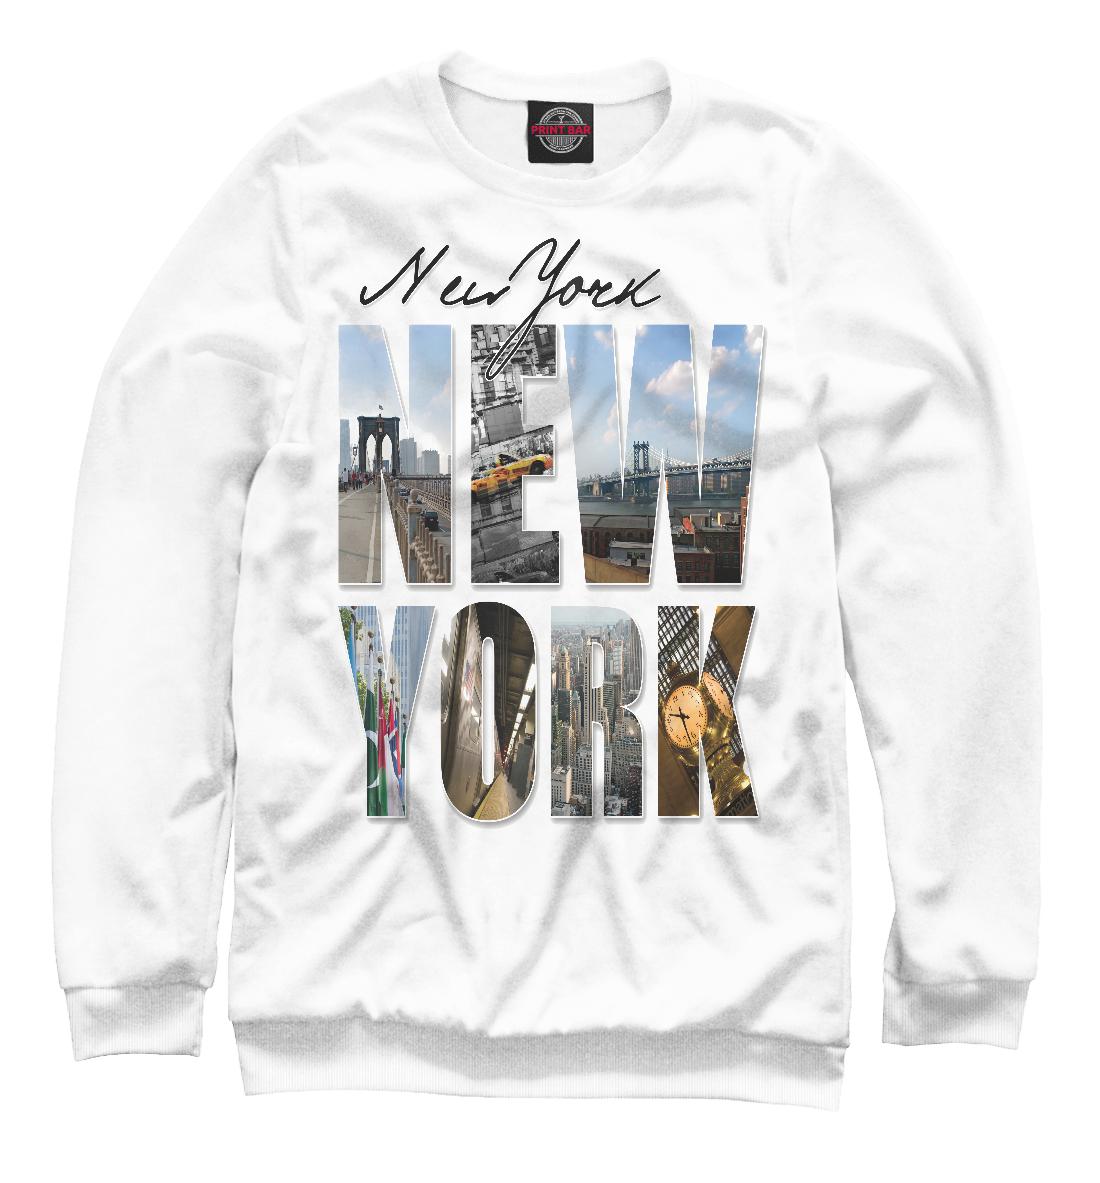 Купить Нью-йорк, Printbar, Свитшоты, USA-972408-swi-2